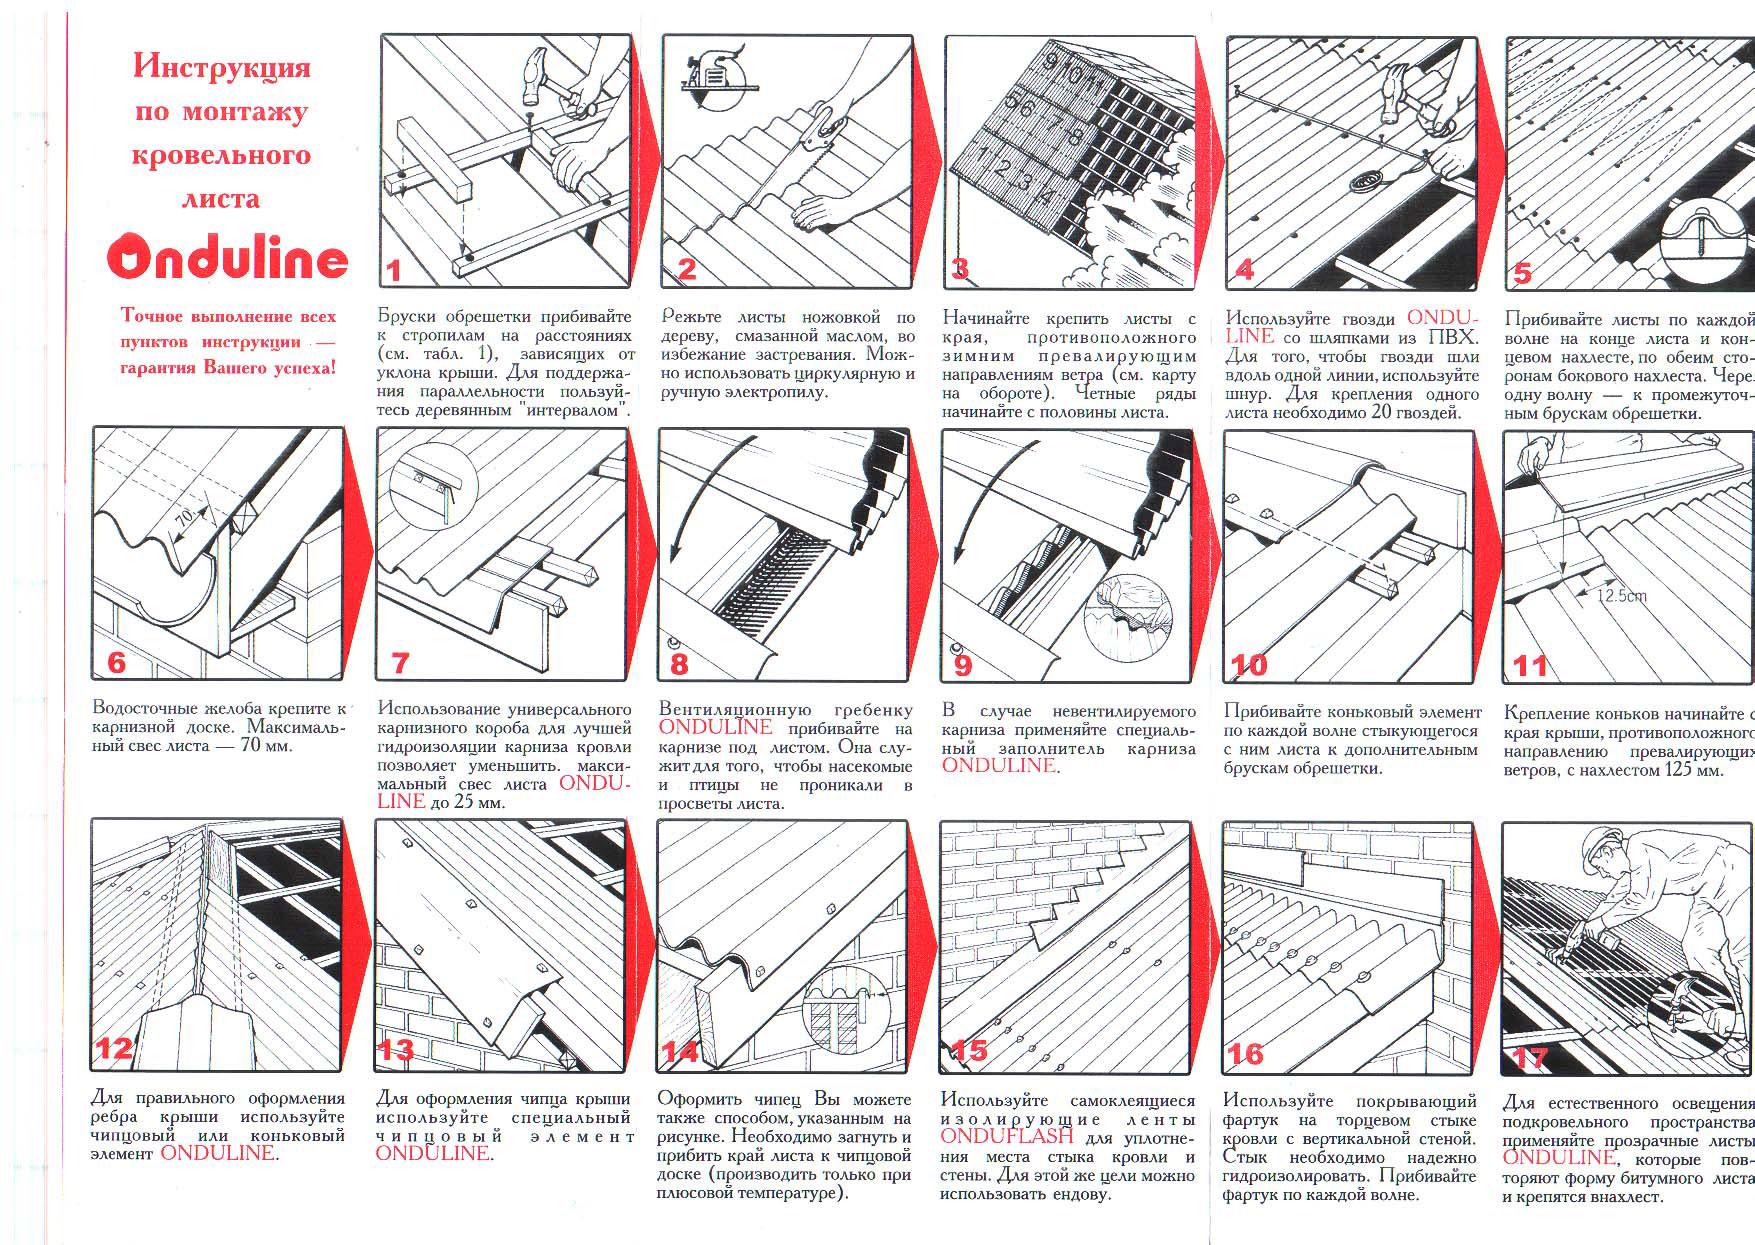 Инструкция по монтажу ондулина своими руками (видео).